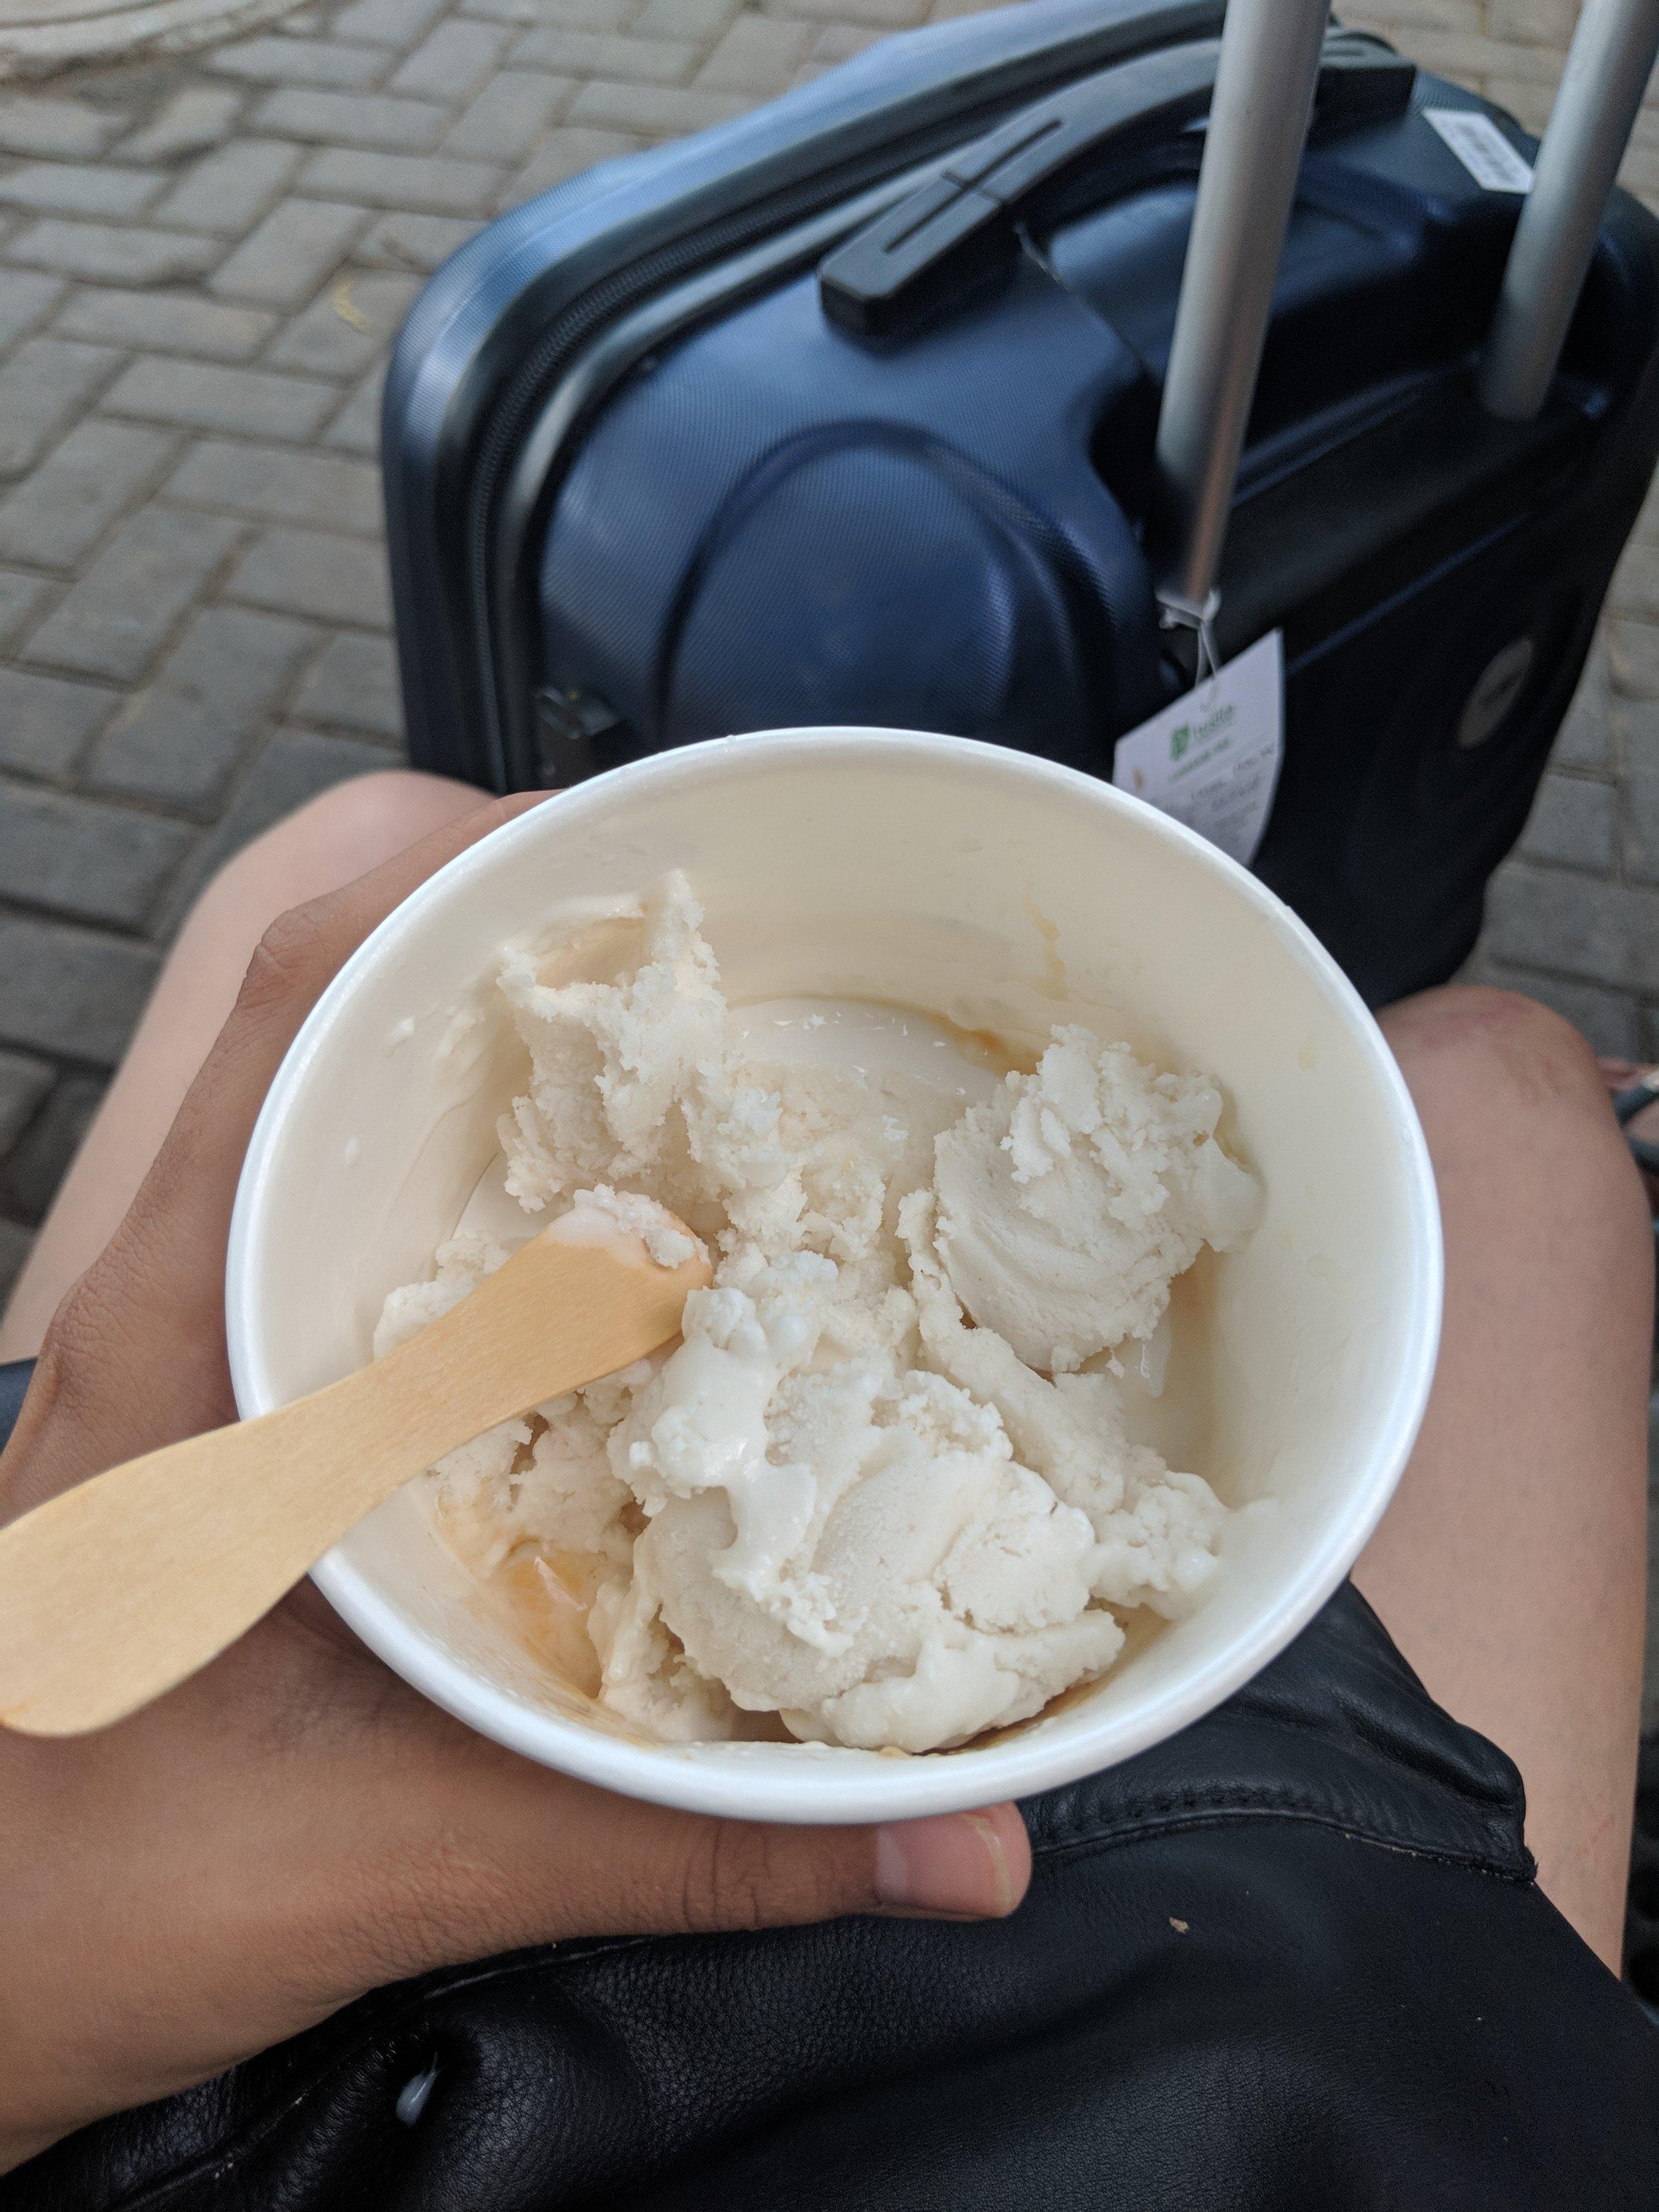 Tender Coconut Ice-cream - creamy and delicious Ice Cream from GoPut Sanur Beach